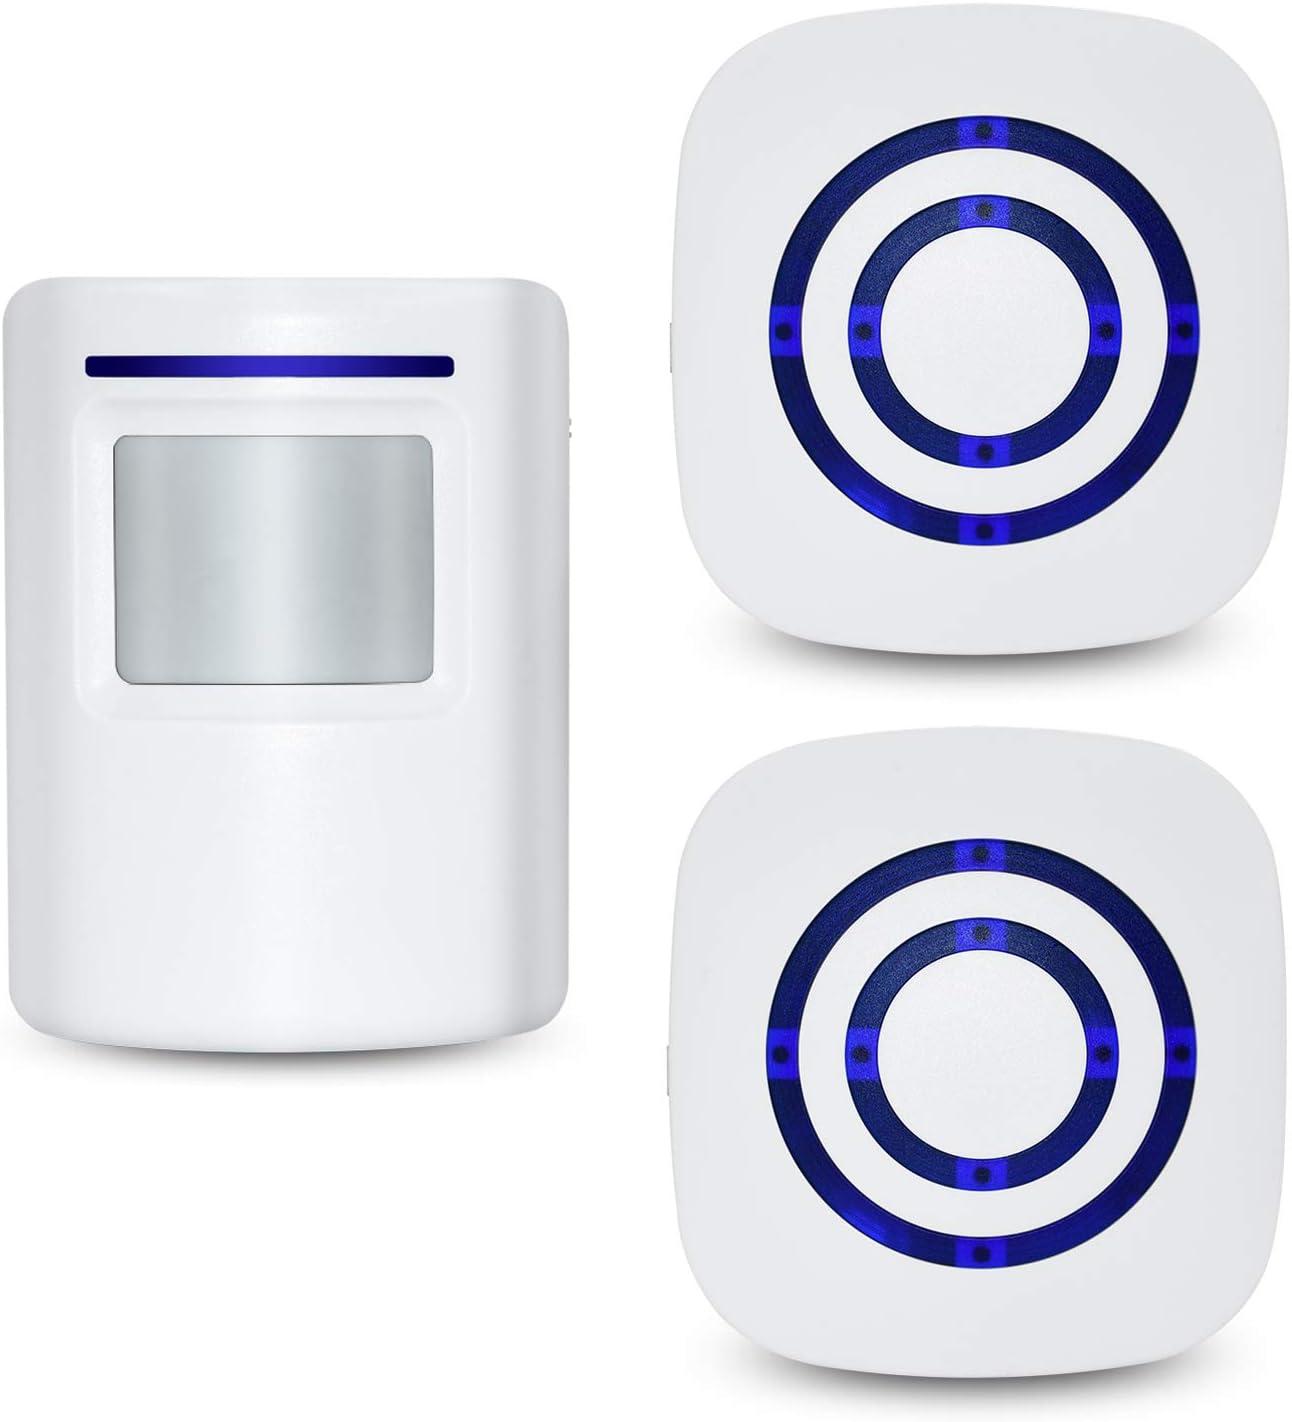 Tengcong Door Chime,Wireless Business Door Motion Sensor Detector Smart Visitor doorbell Home Security Driveway Alarm with 1 Sensor and 2 Receiver,38 Chime Tunes - LED Indicators (1 Sensor + 2 Receiv)